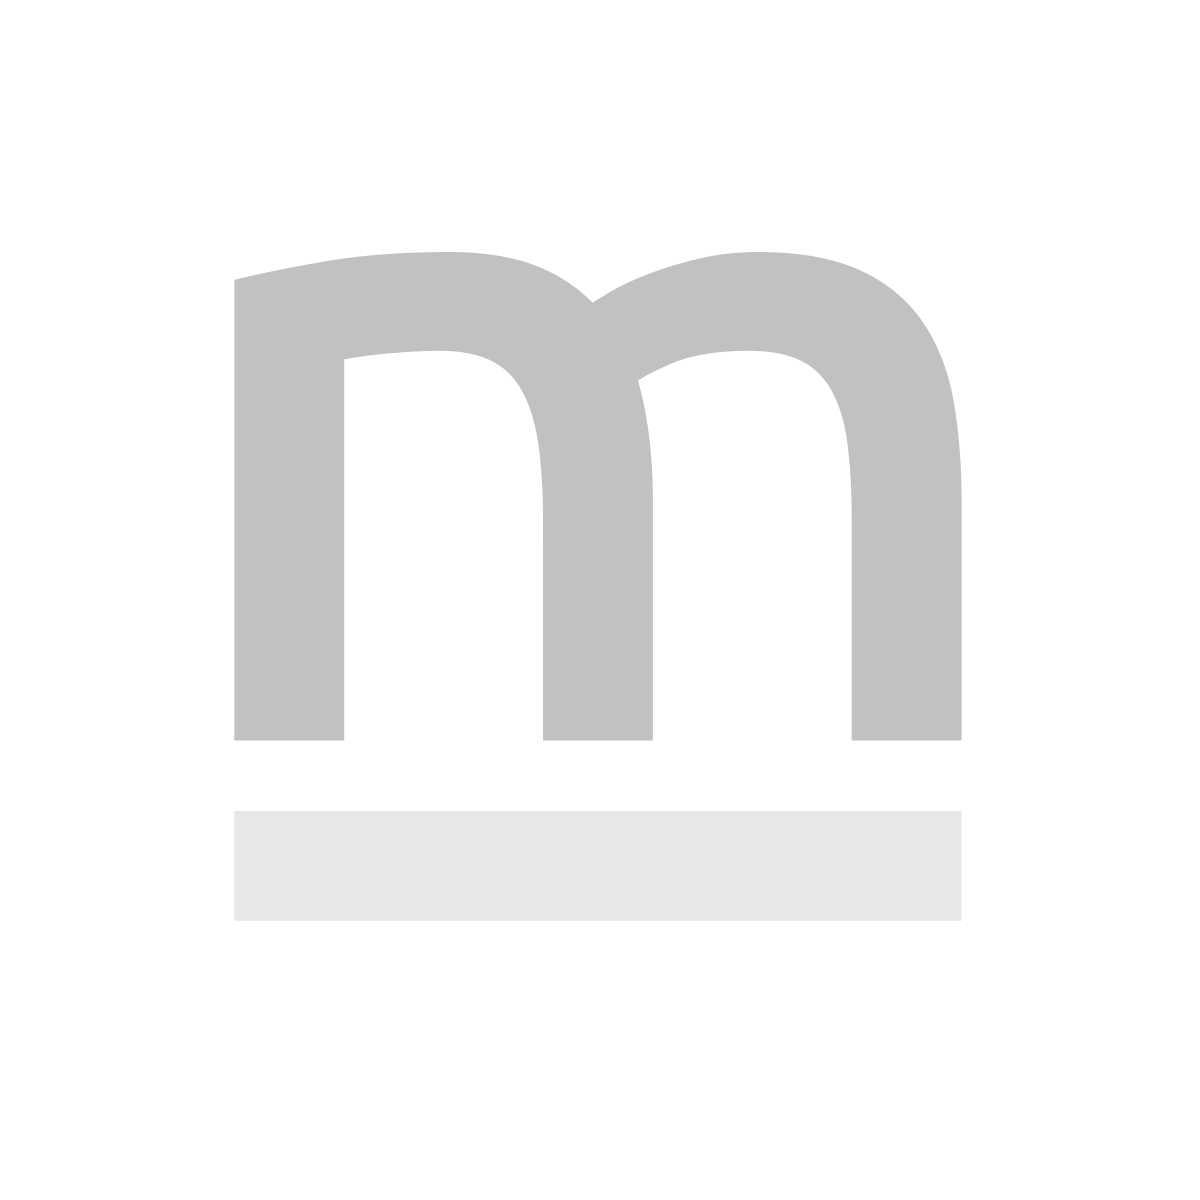 Krzesło NAPO VELVET jasno szare